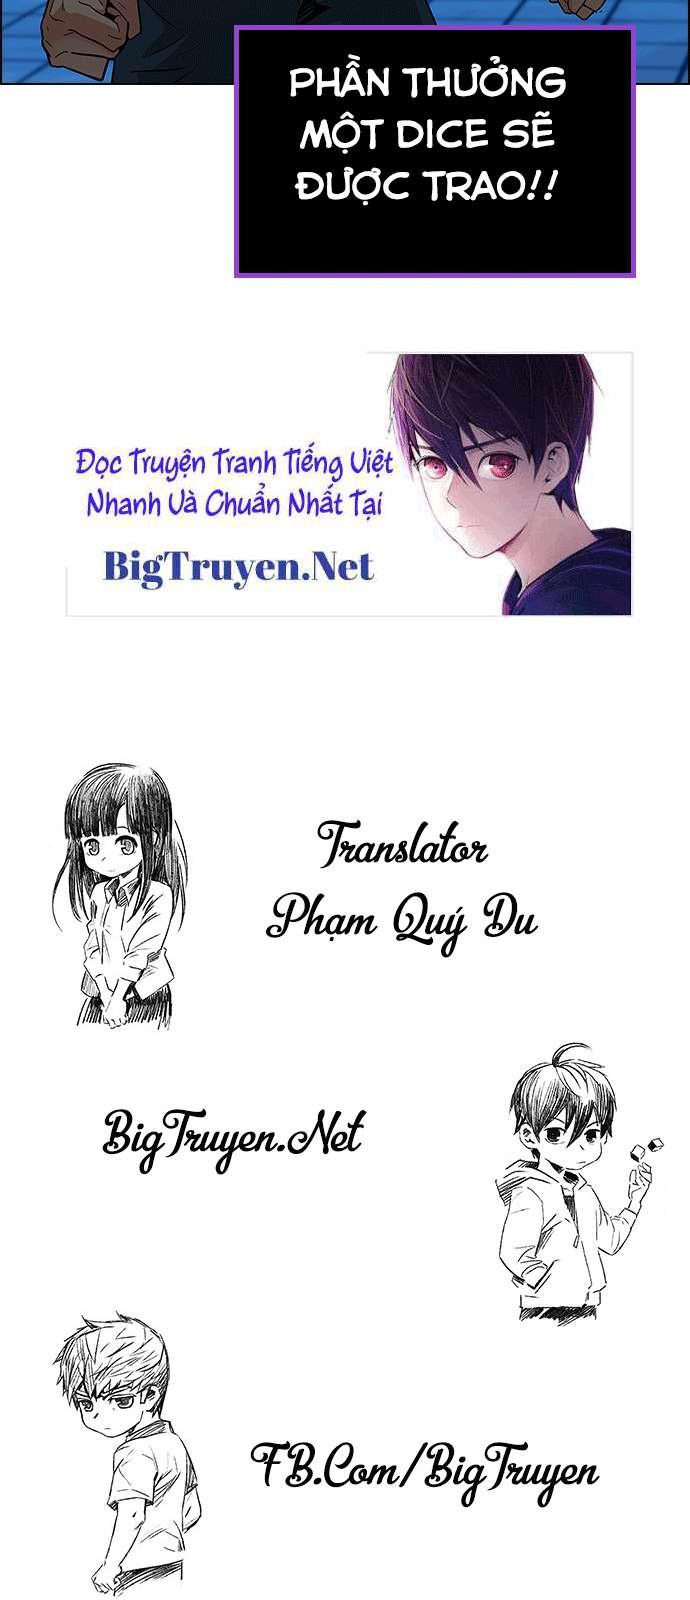 DICE Chapter 157 - Lhmanga.net